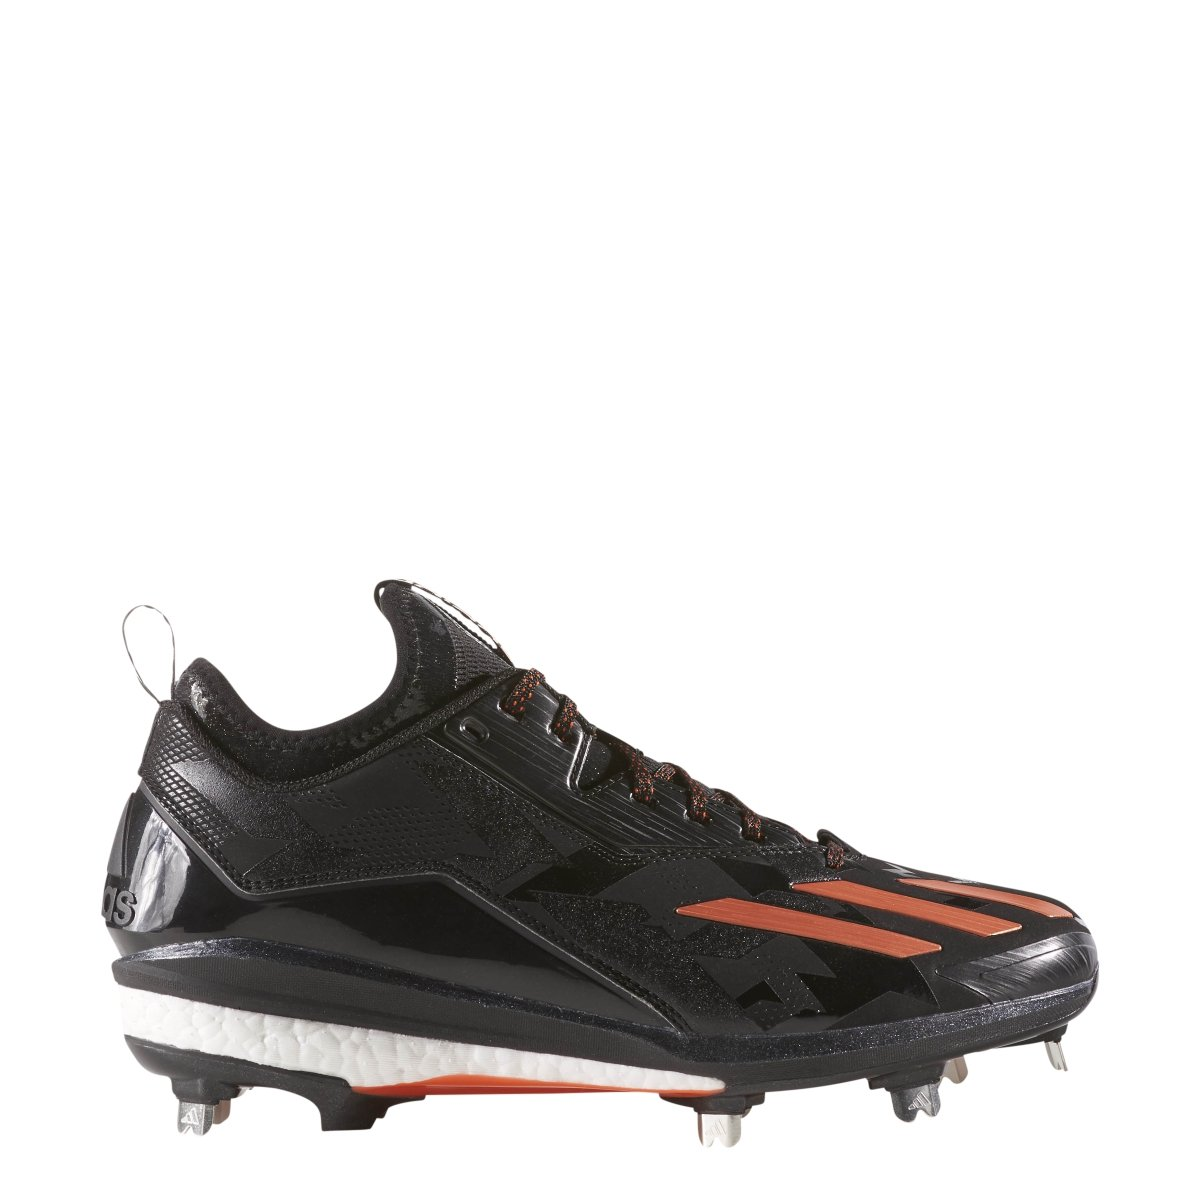 AdidasメンズEnergy Boost Icon 2。0 Low Metal Baseball Cleats B0739SCJCM 9|ブラック/オレンジ ブラック/オレンジ 9